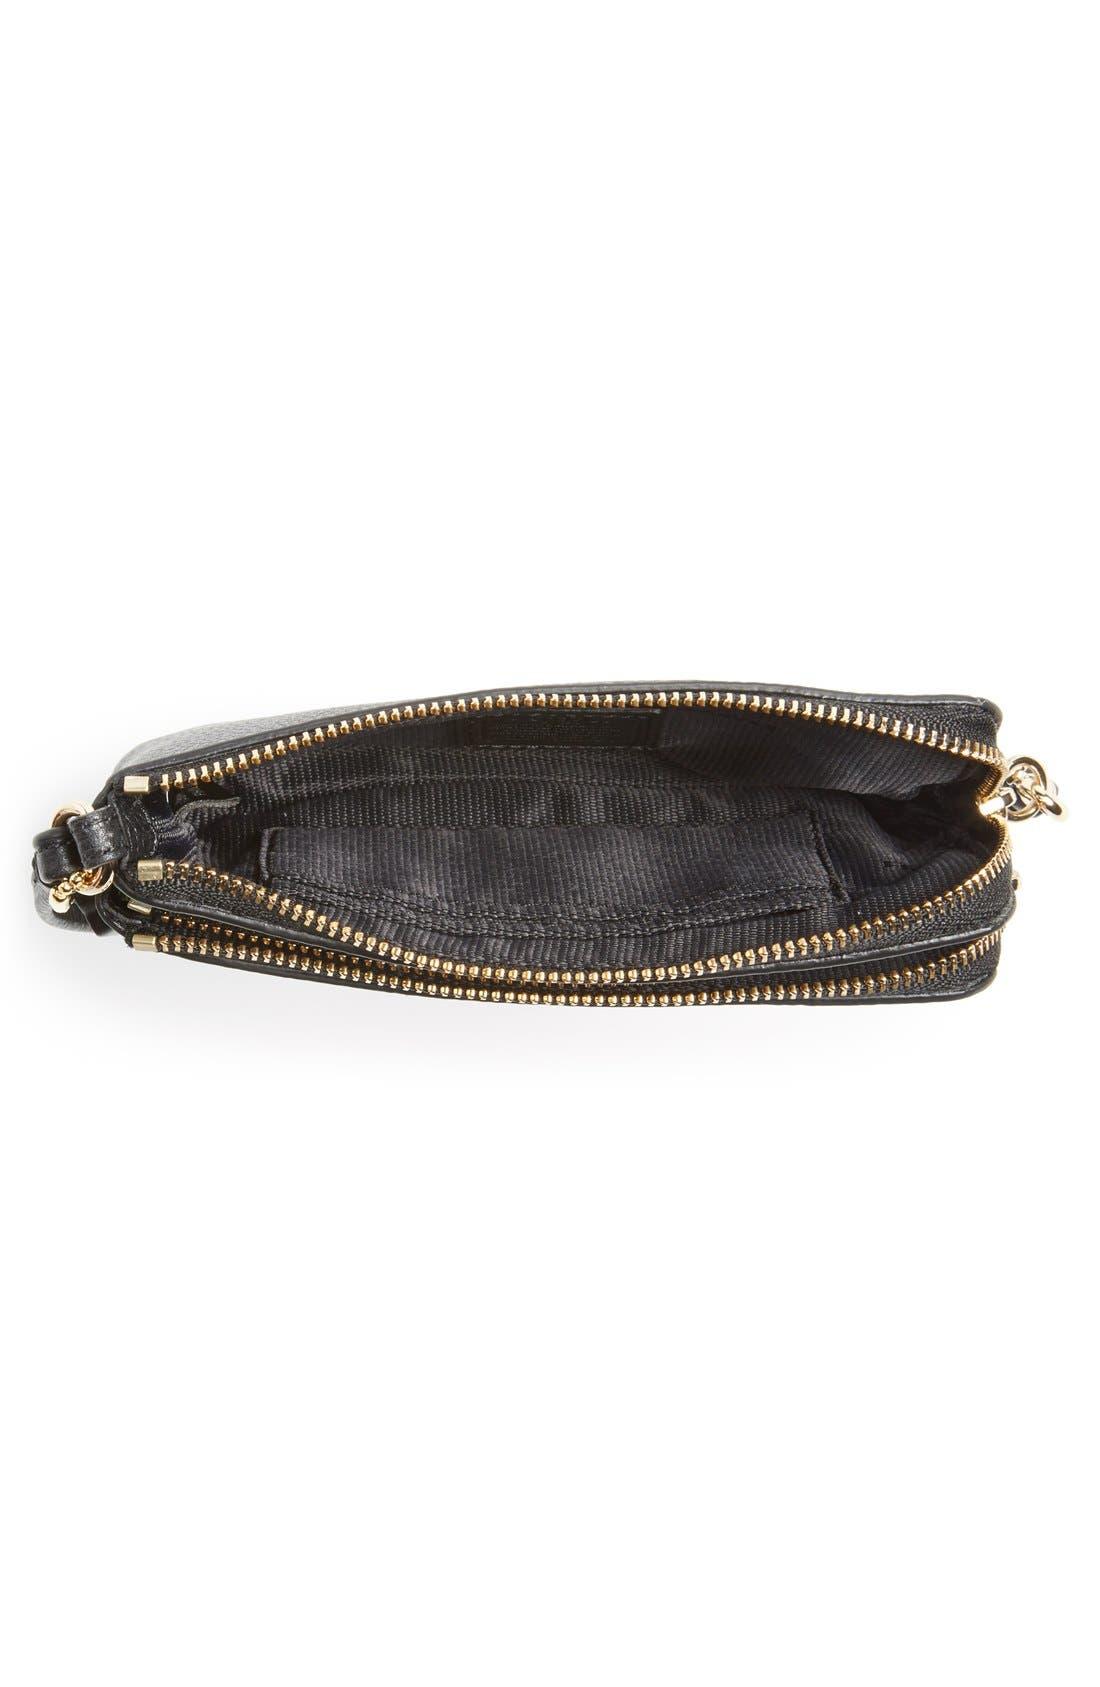 COACH, 'Madison' Double Zip Leather Wallet, Alternate thumbnail 6, color, 001